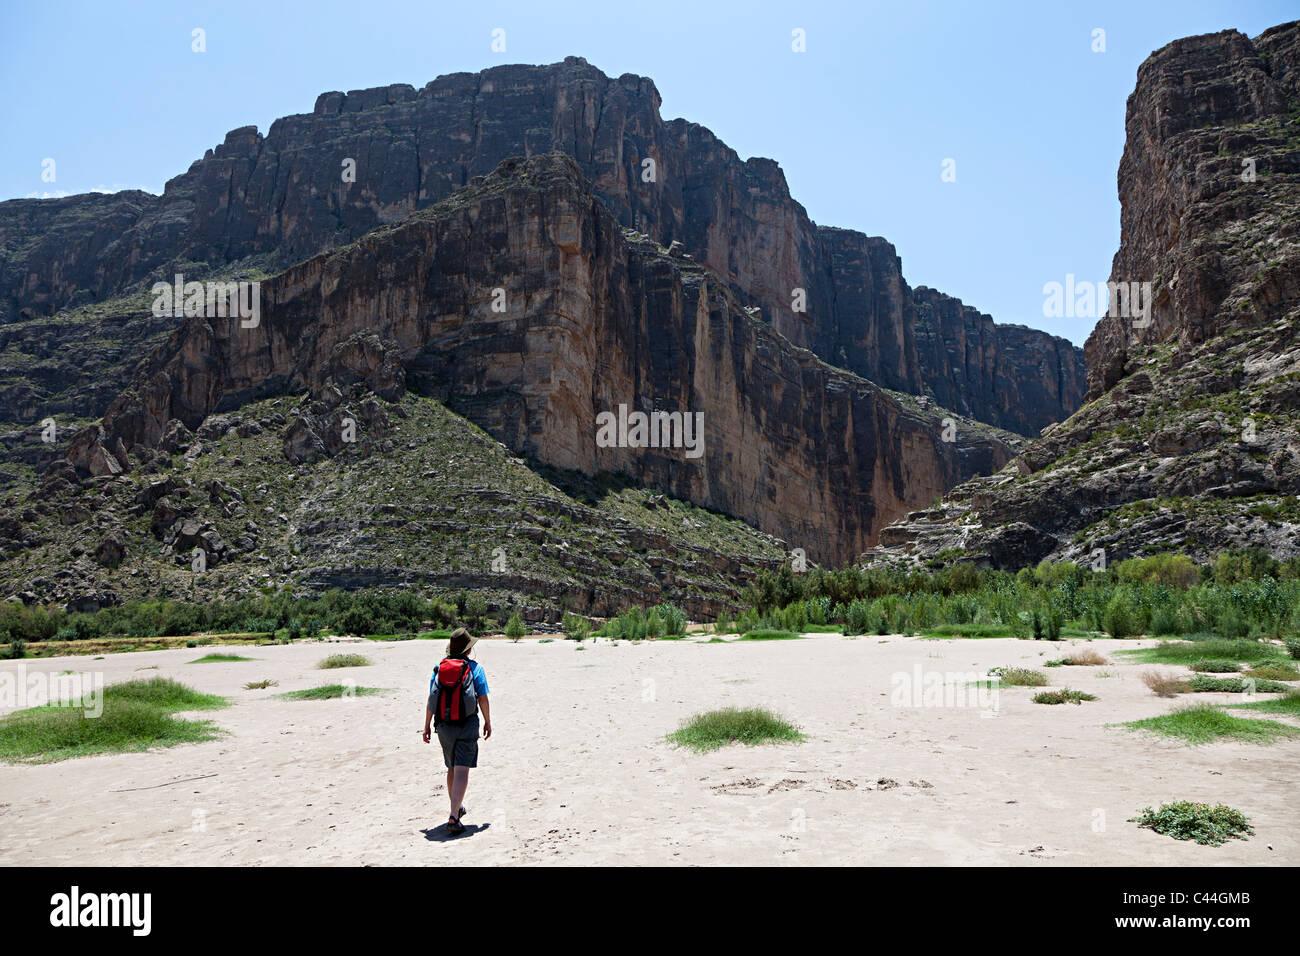 Hiking towards Santa Elena Canyon Rio Grande River Big Bend National Park Texas USA - Stock Image